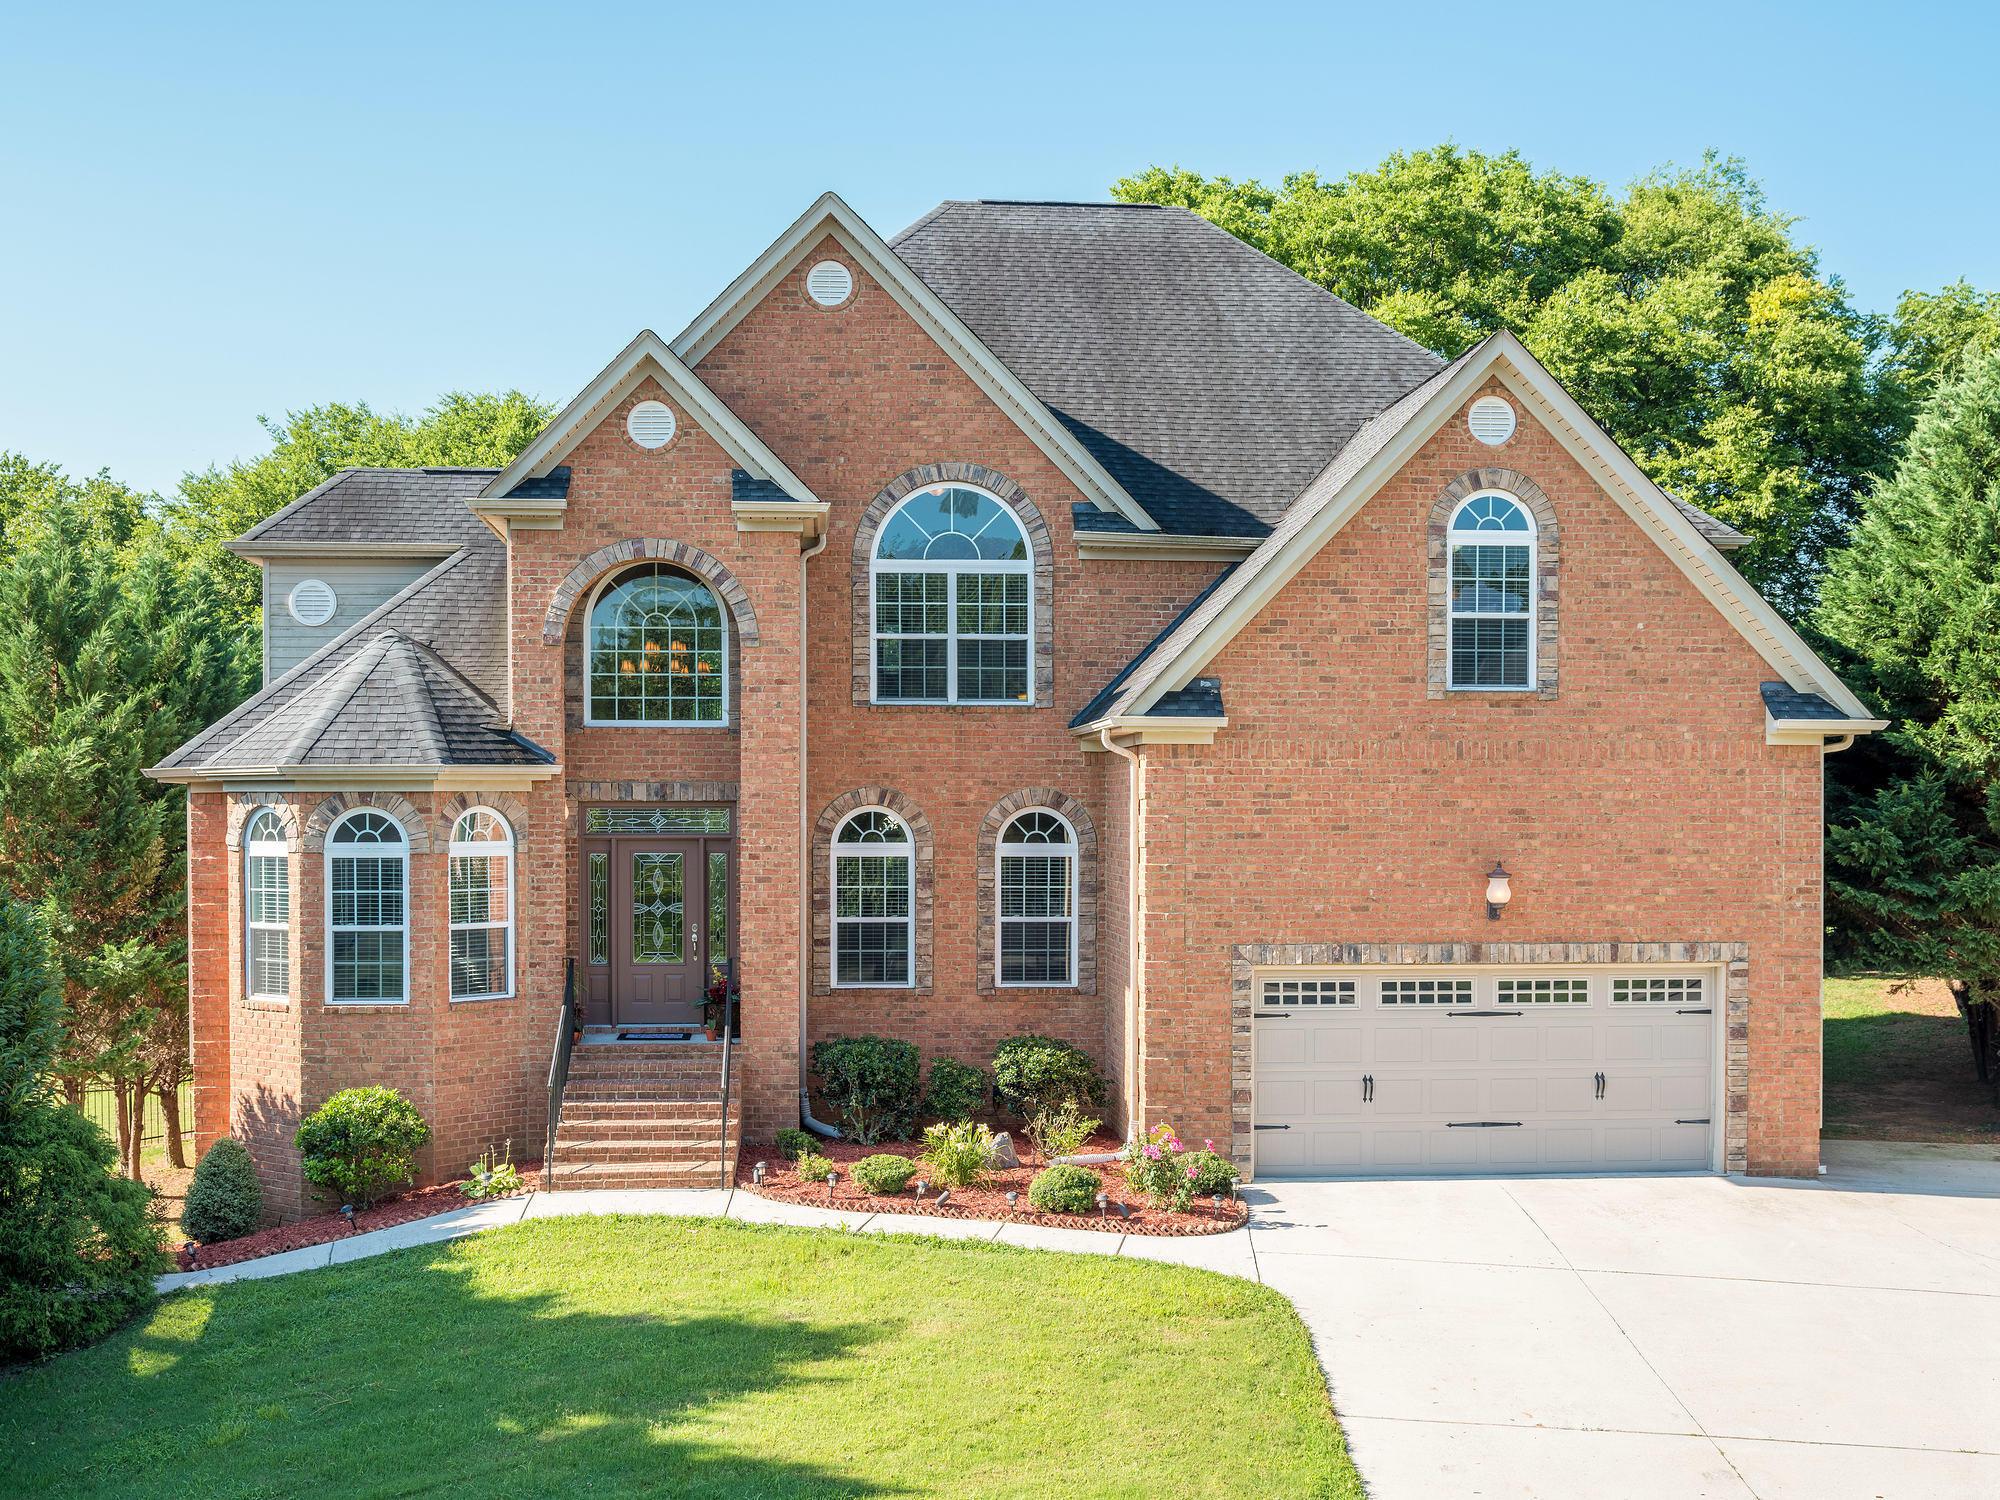 9670  Pecan Springs  Cir, Chattanooga in Hamilton County, TN 37421 Home for Sale